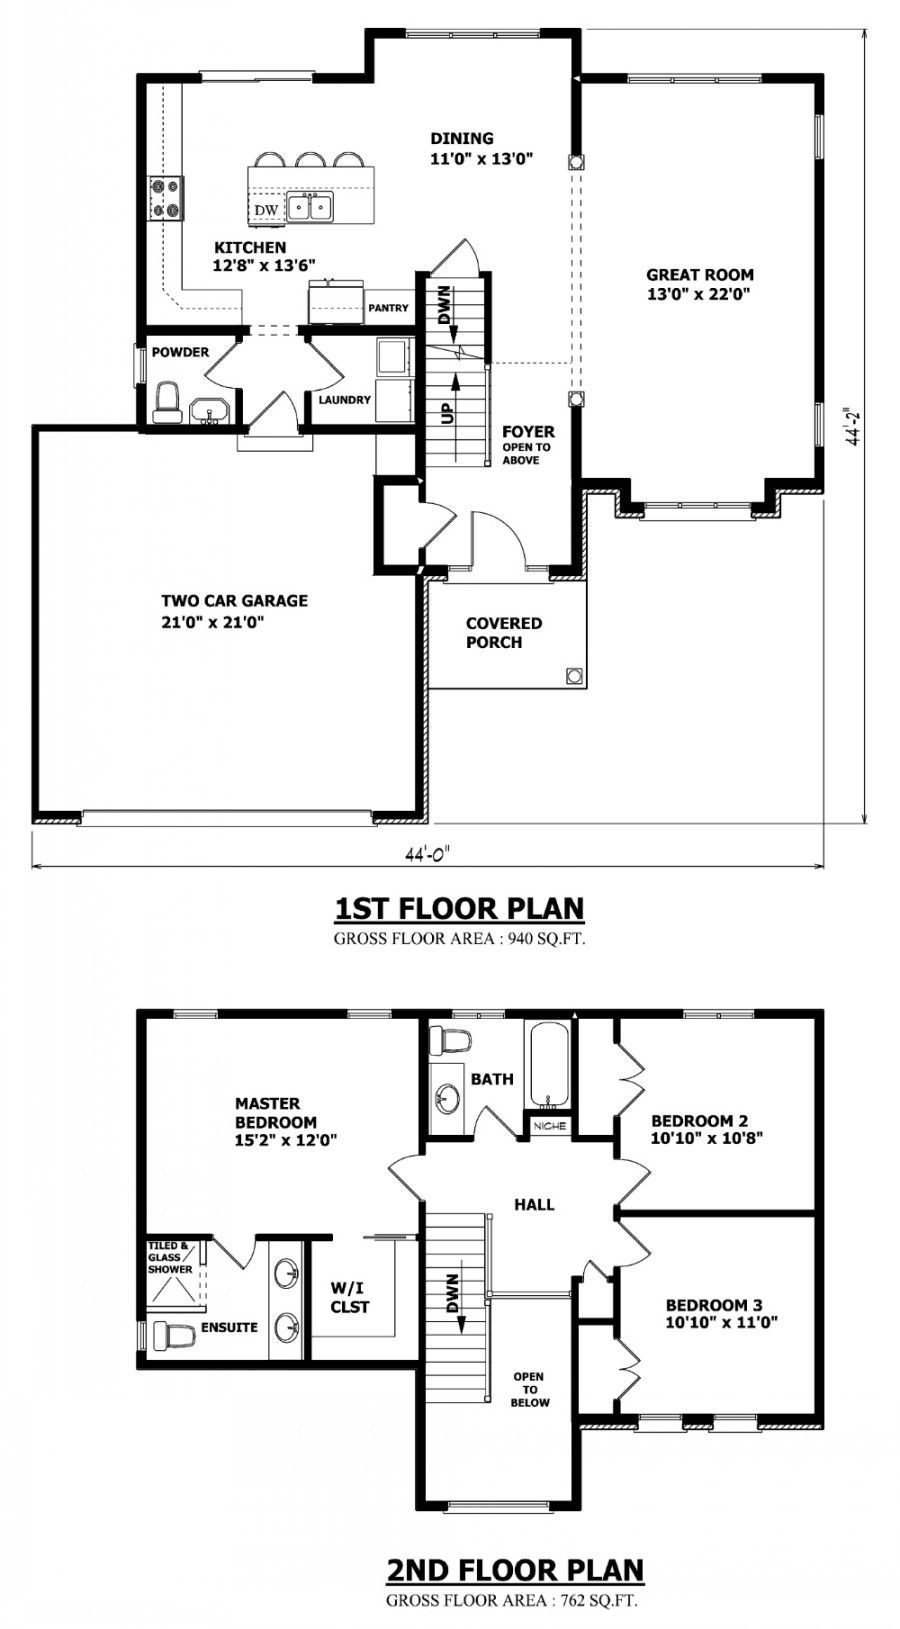 HOME DESIGNS Custom House Plans Stock House Plans amp ...